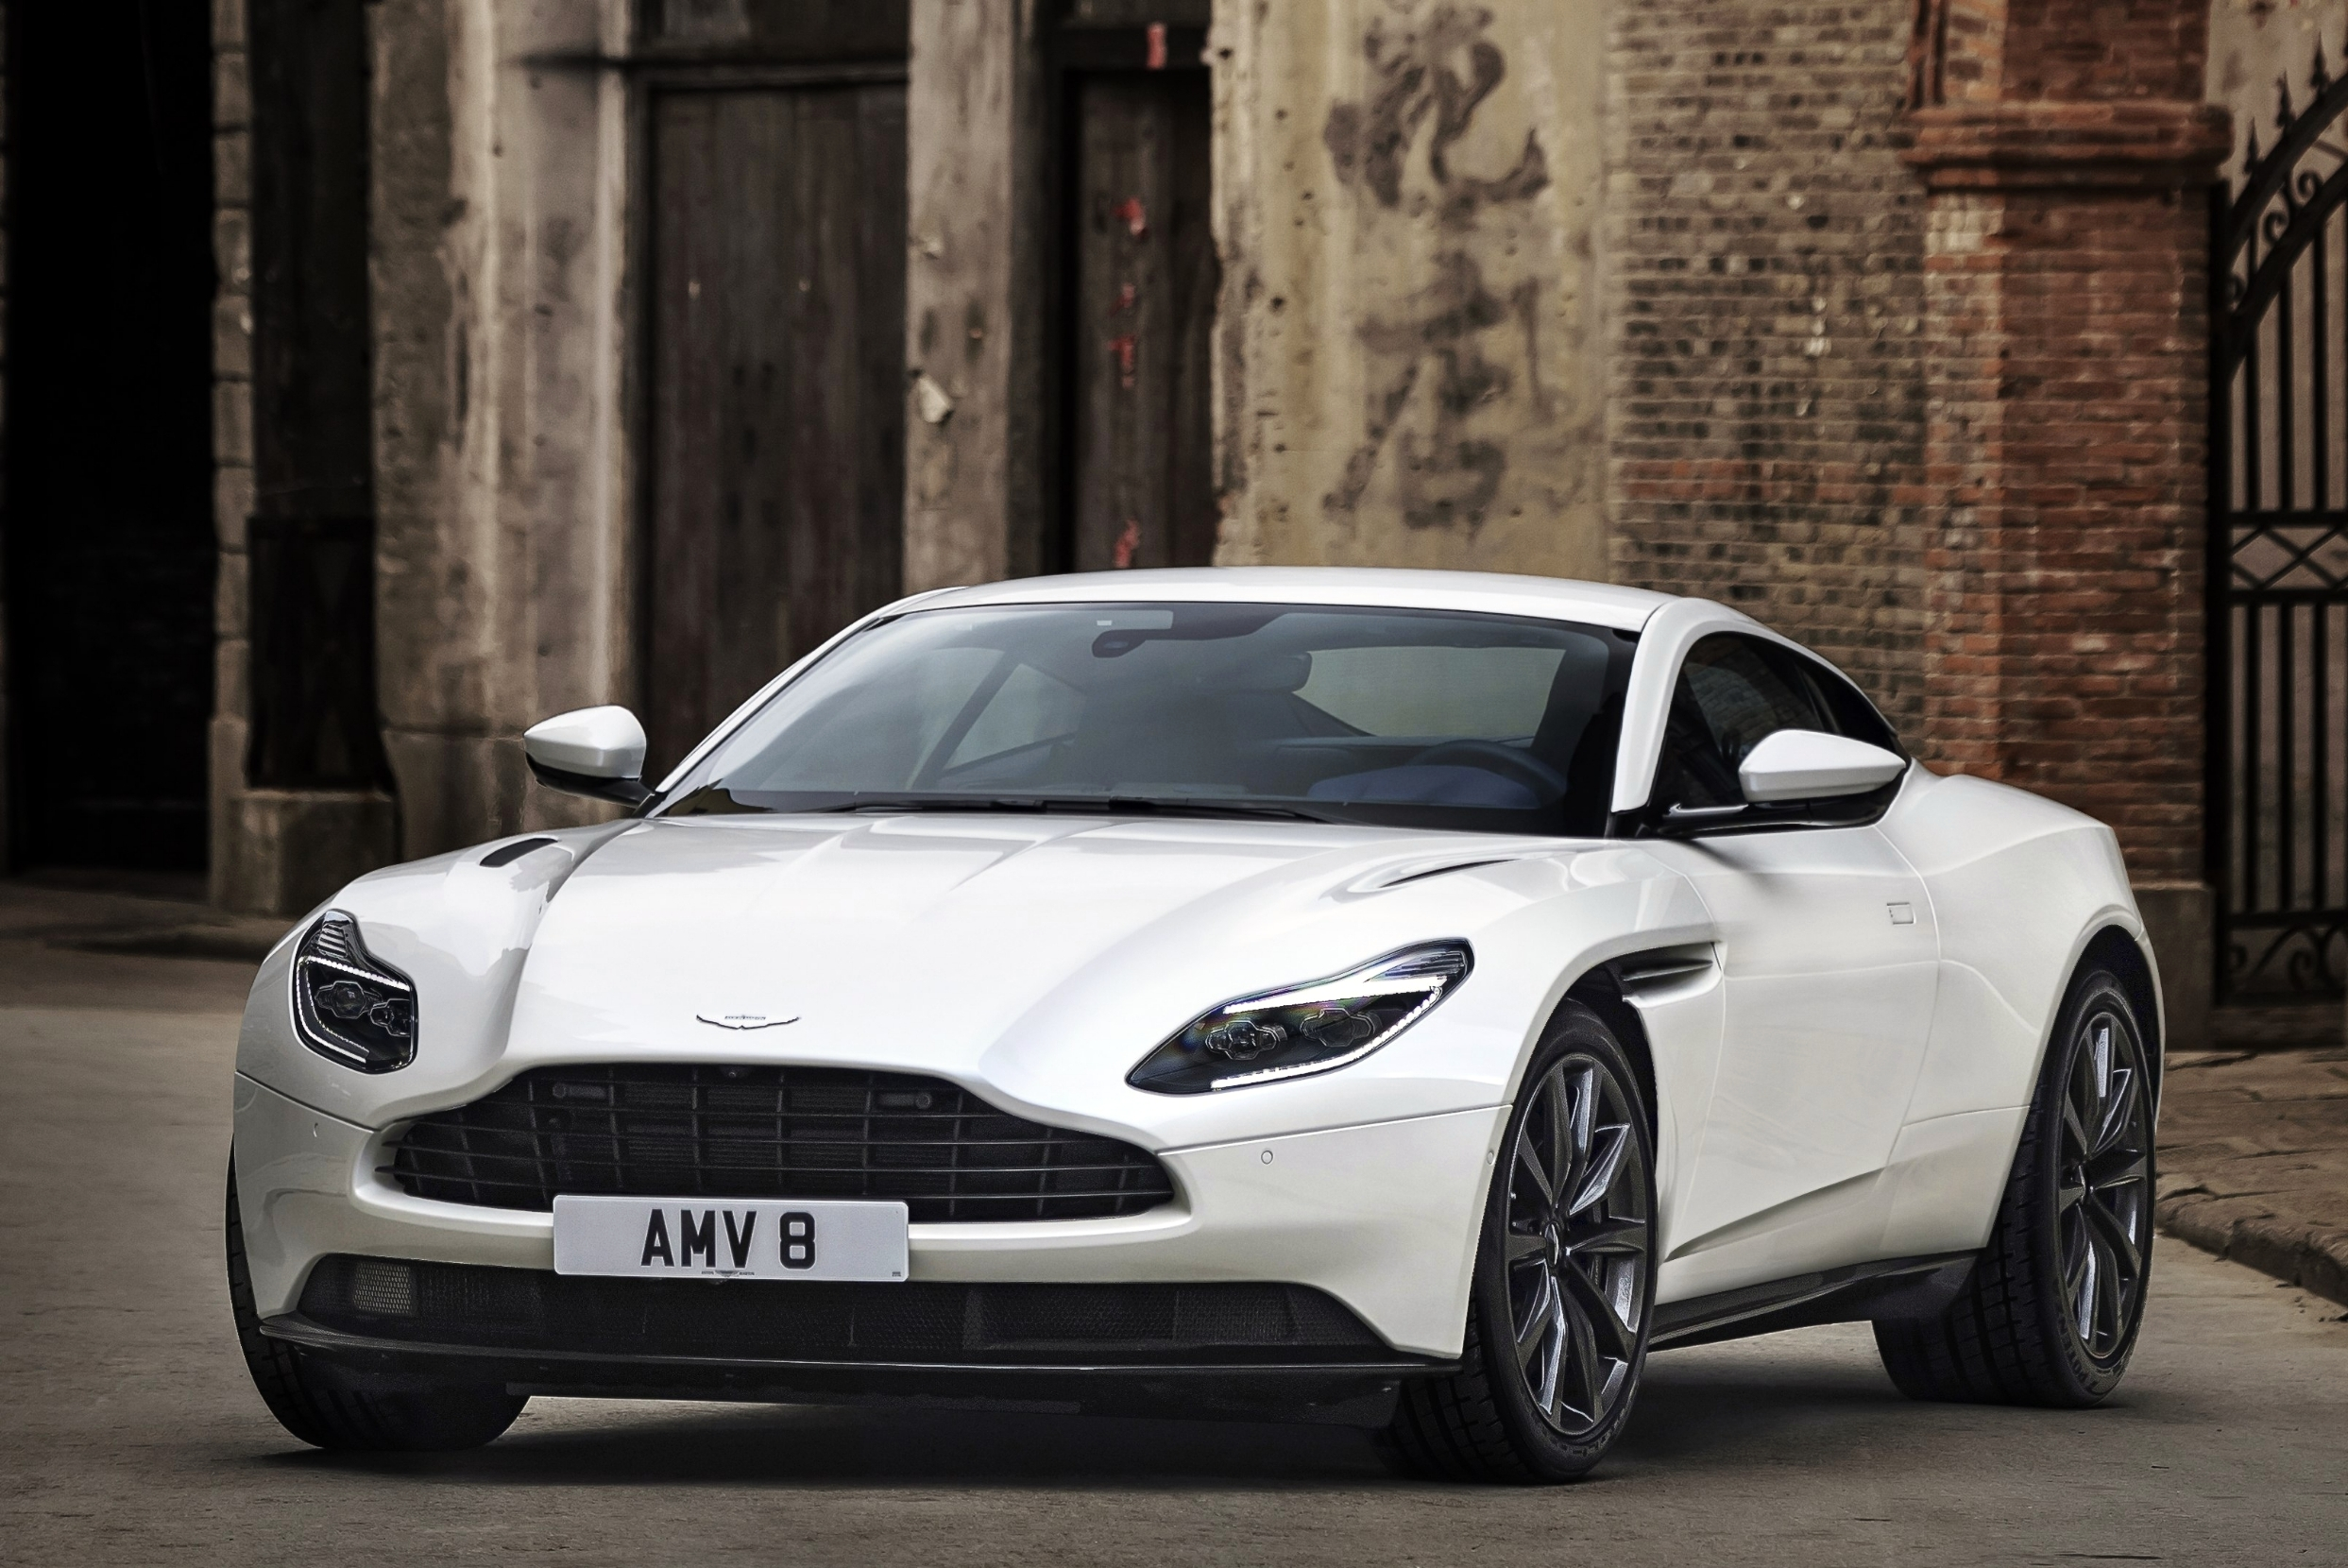 Aston Martin Db11 Ganha Motor V8 Biturbo Da Amg Quatro Rodas